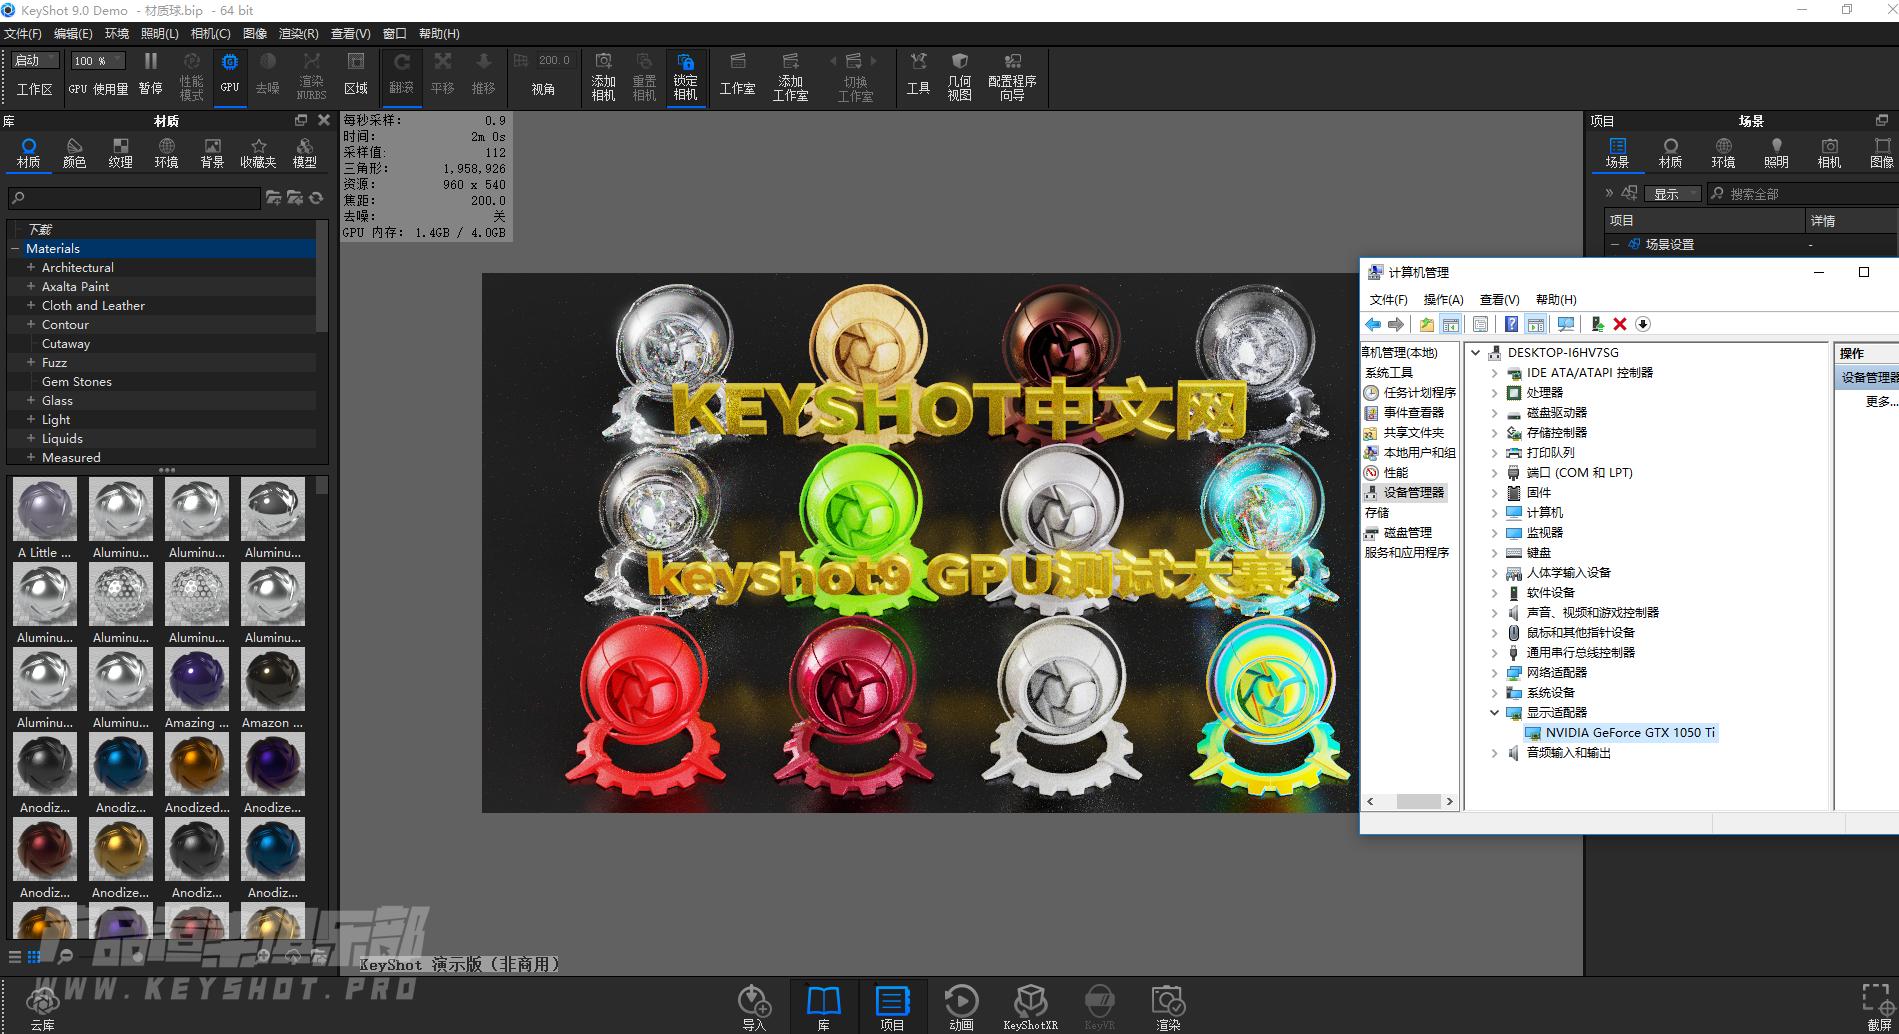 keyshot9—8700K+1050Ti 评测